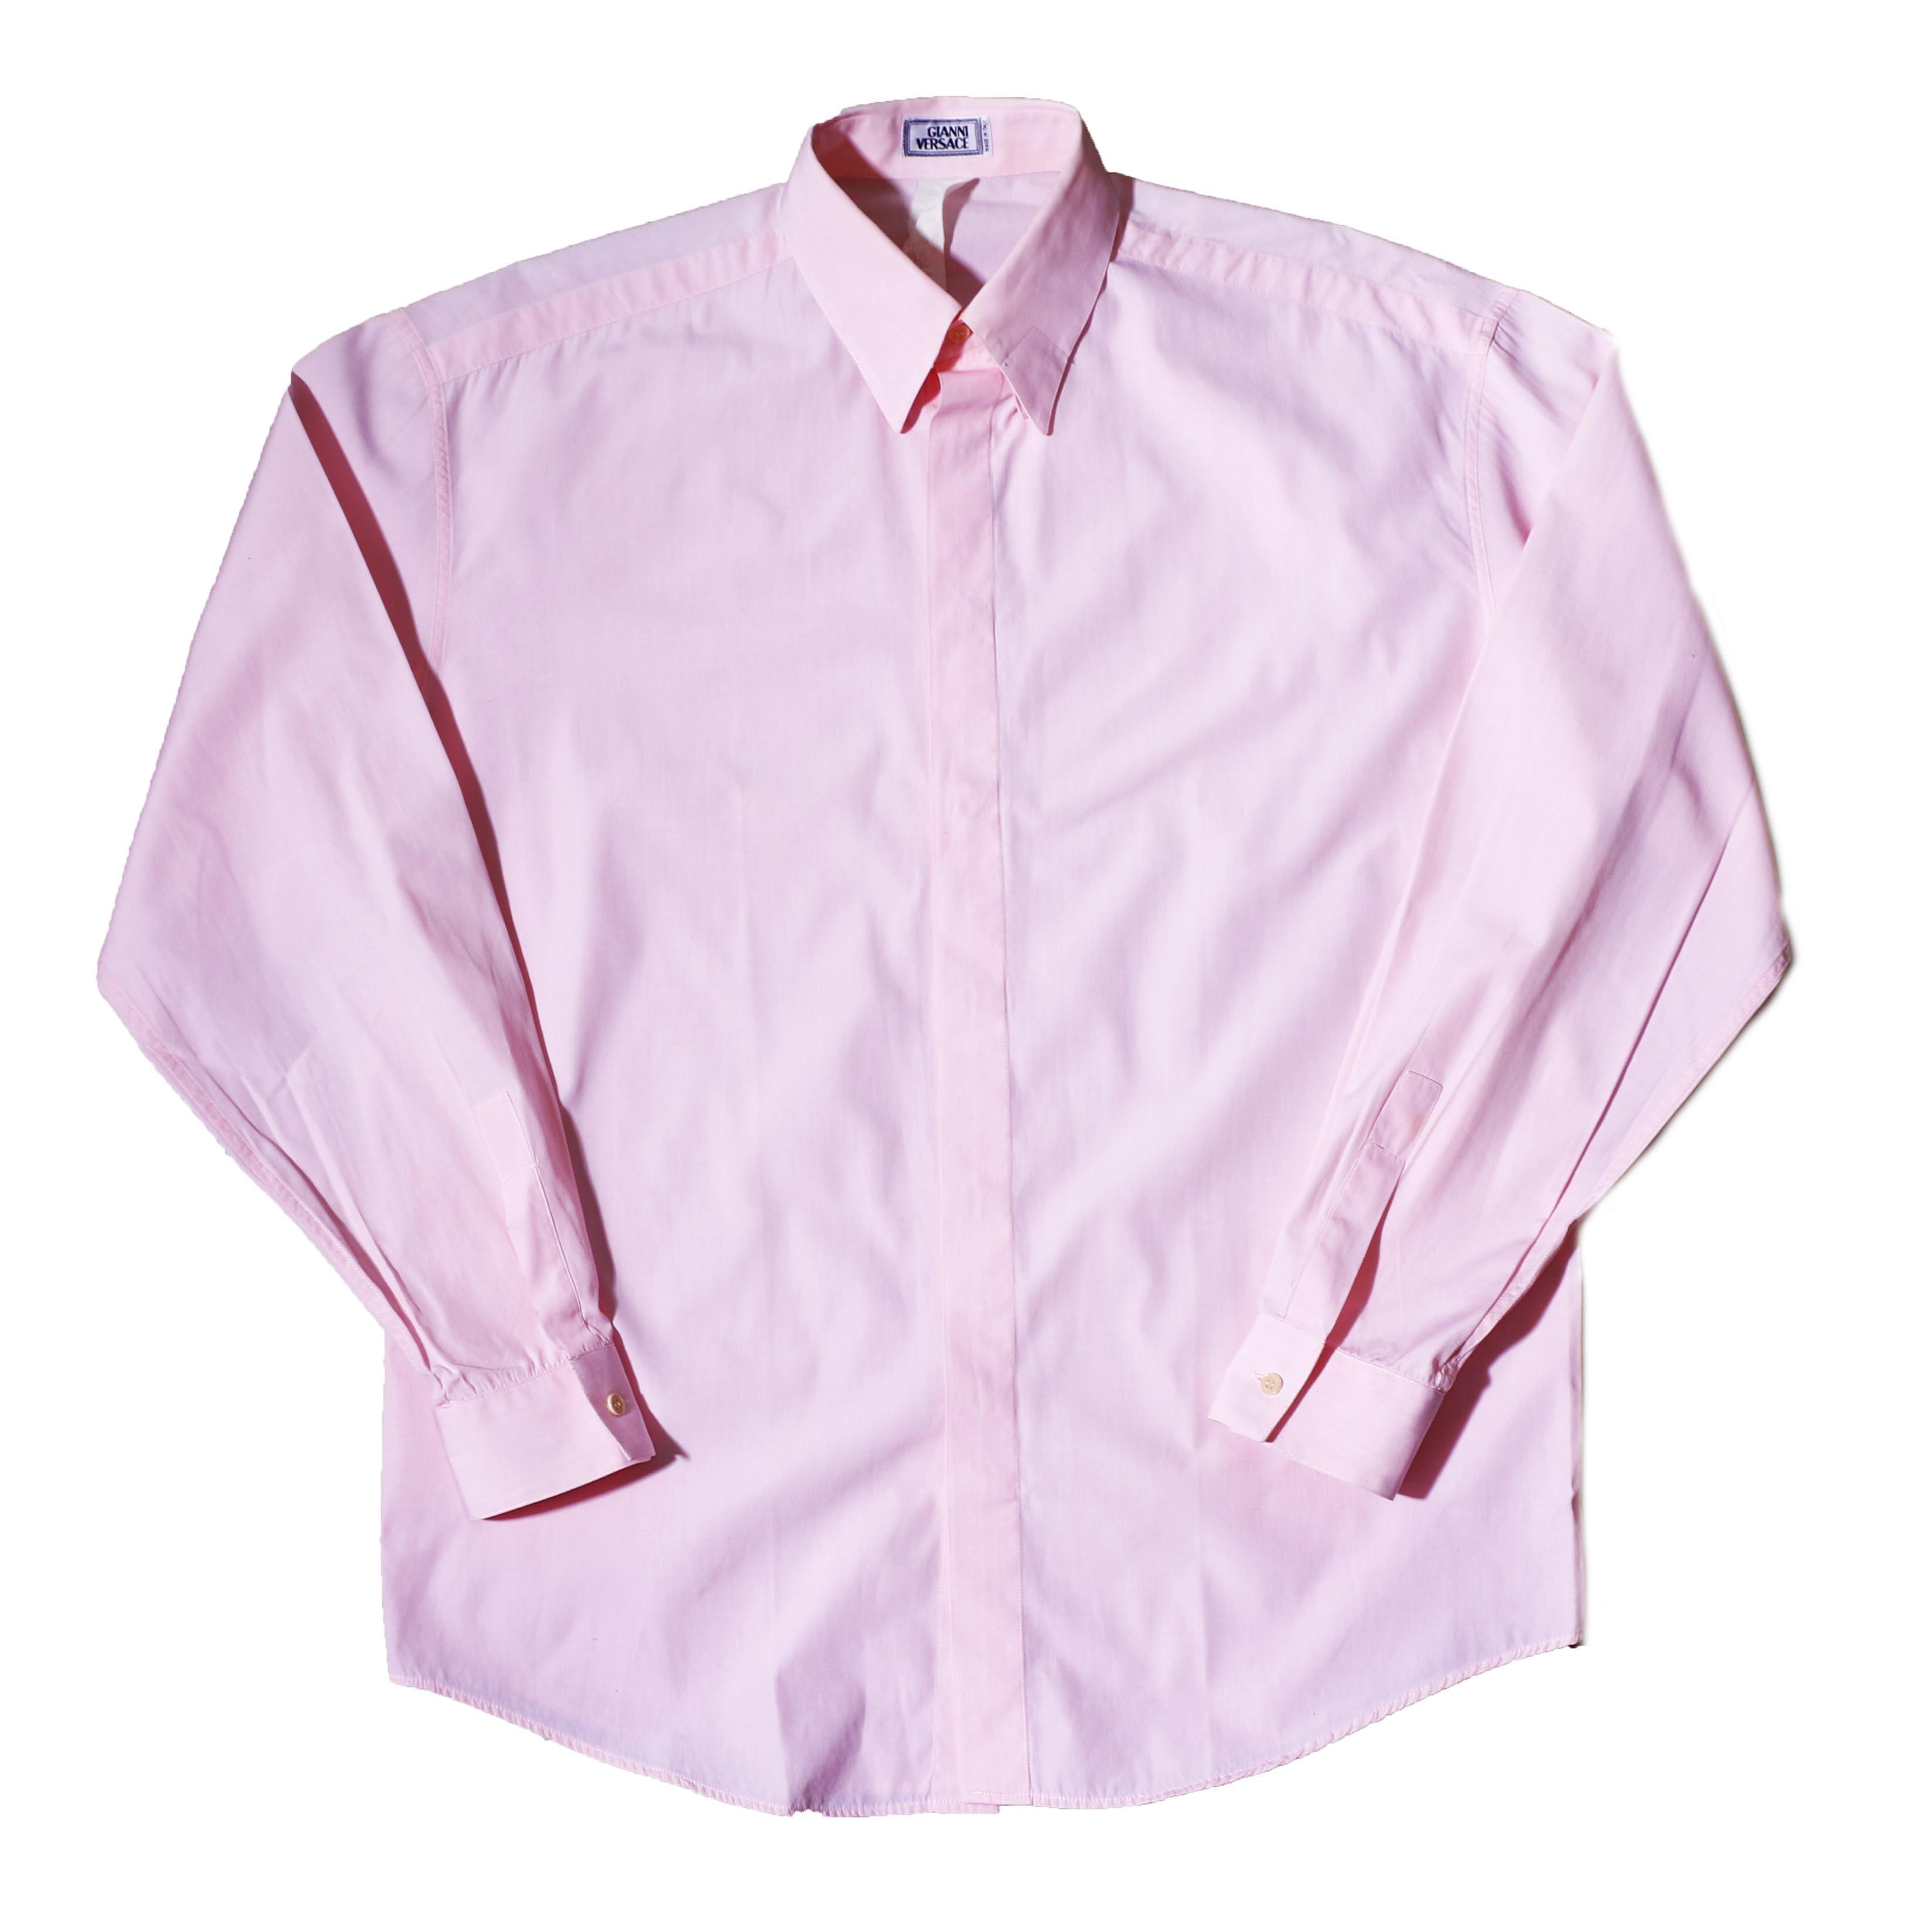 GianniVersace BabyPink DressShirts